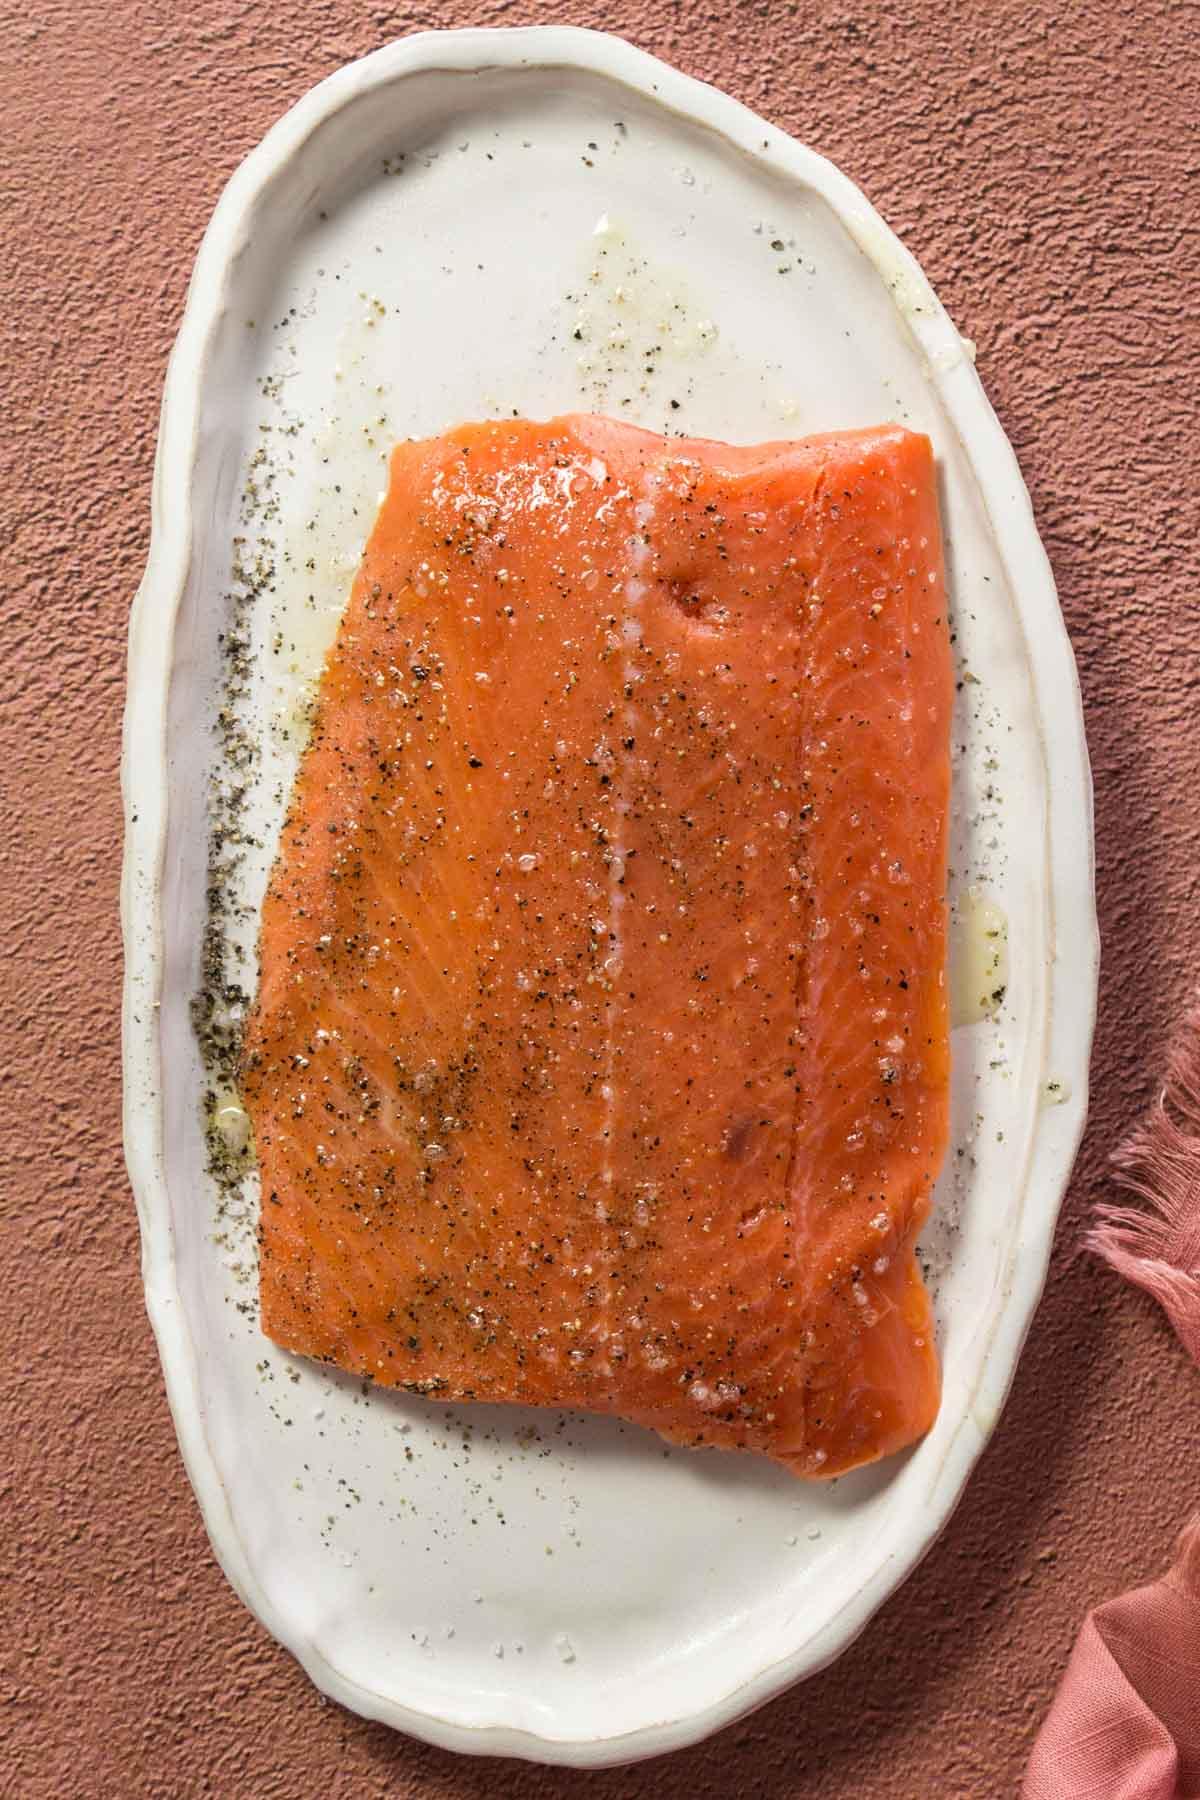 Seasoned Sockeye salmon on a white plate